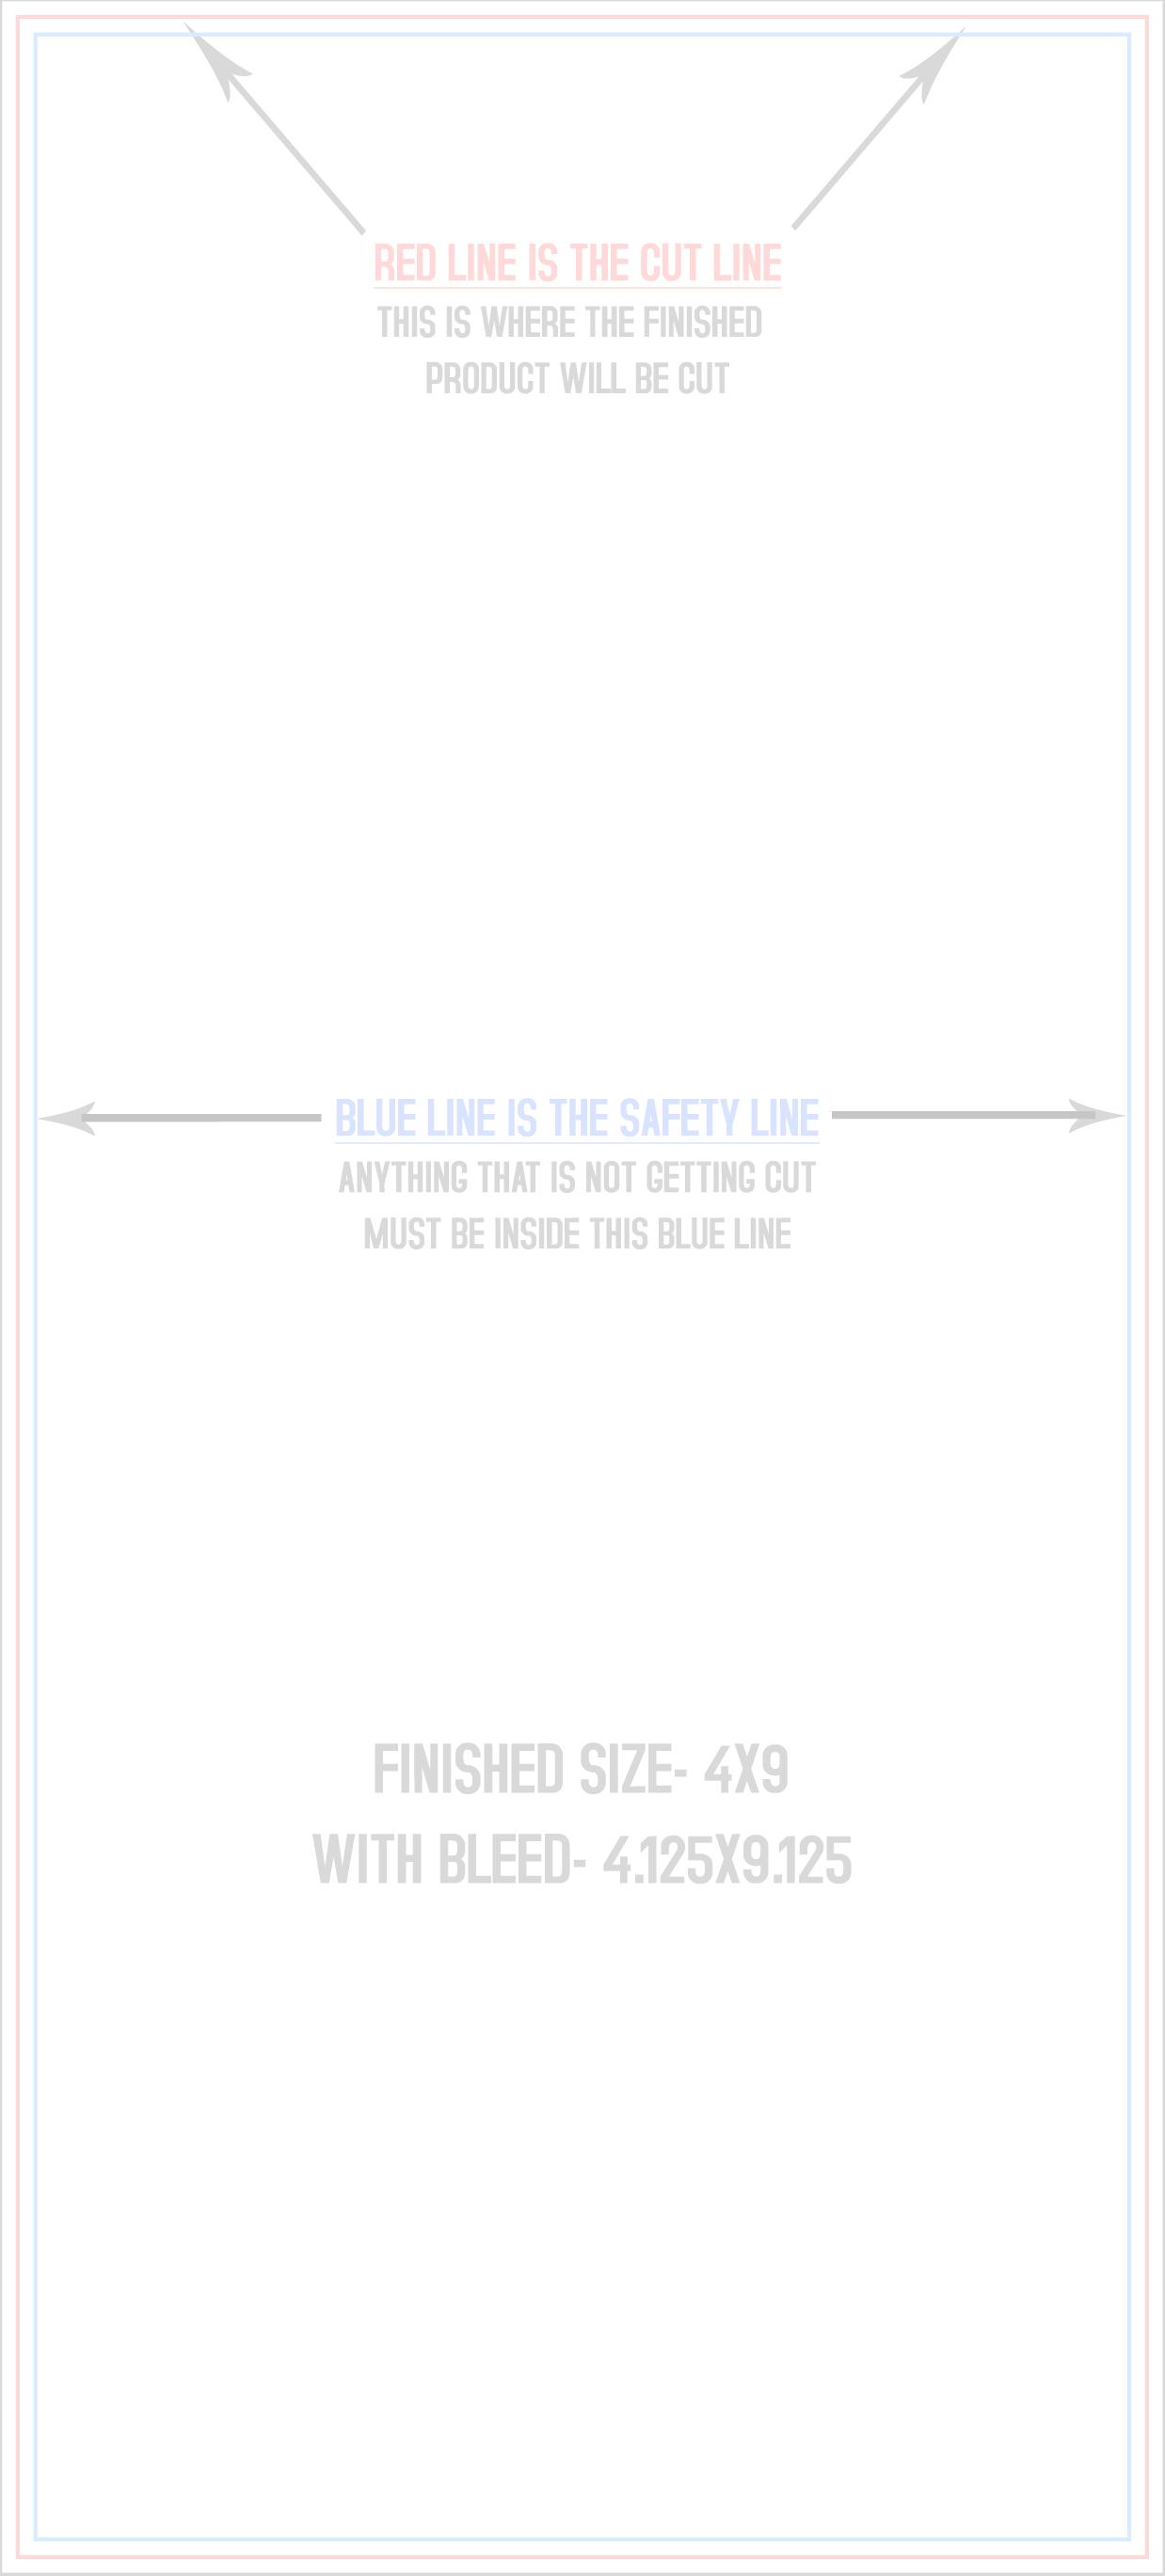 4x9 Full Color Rack Card Printing Matte or Gloss Coating Free